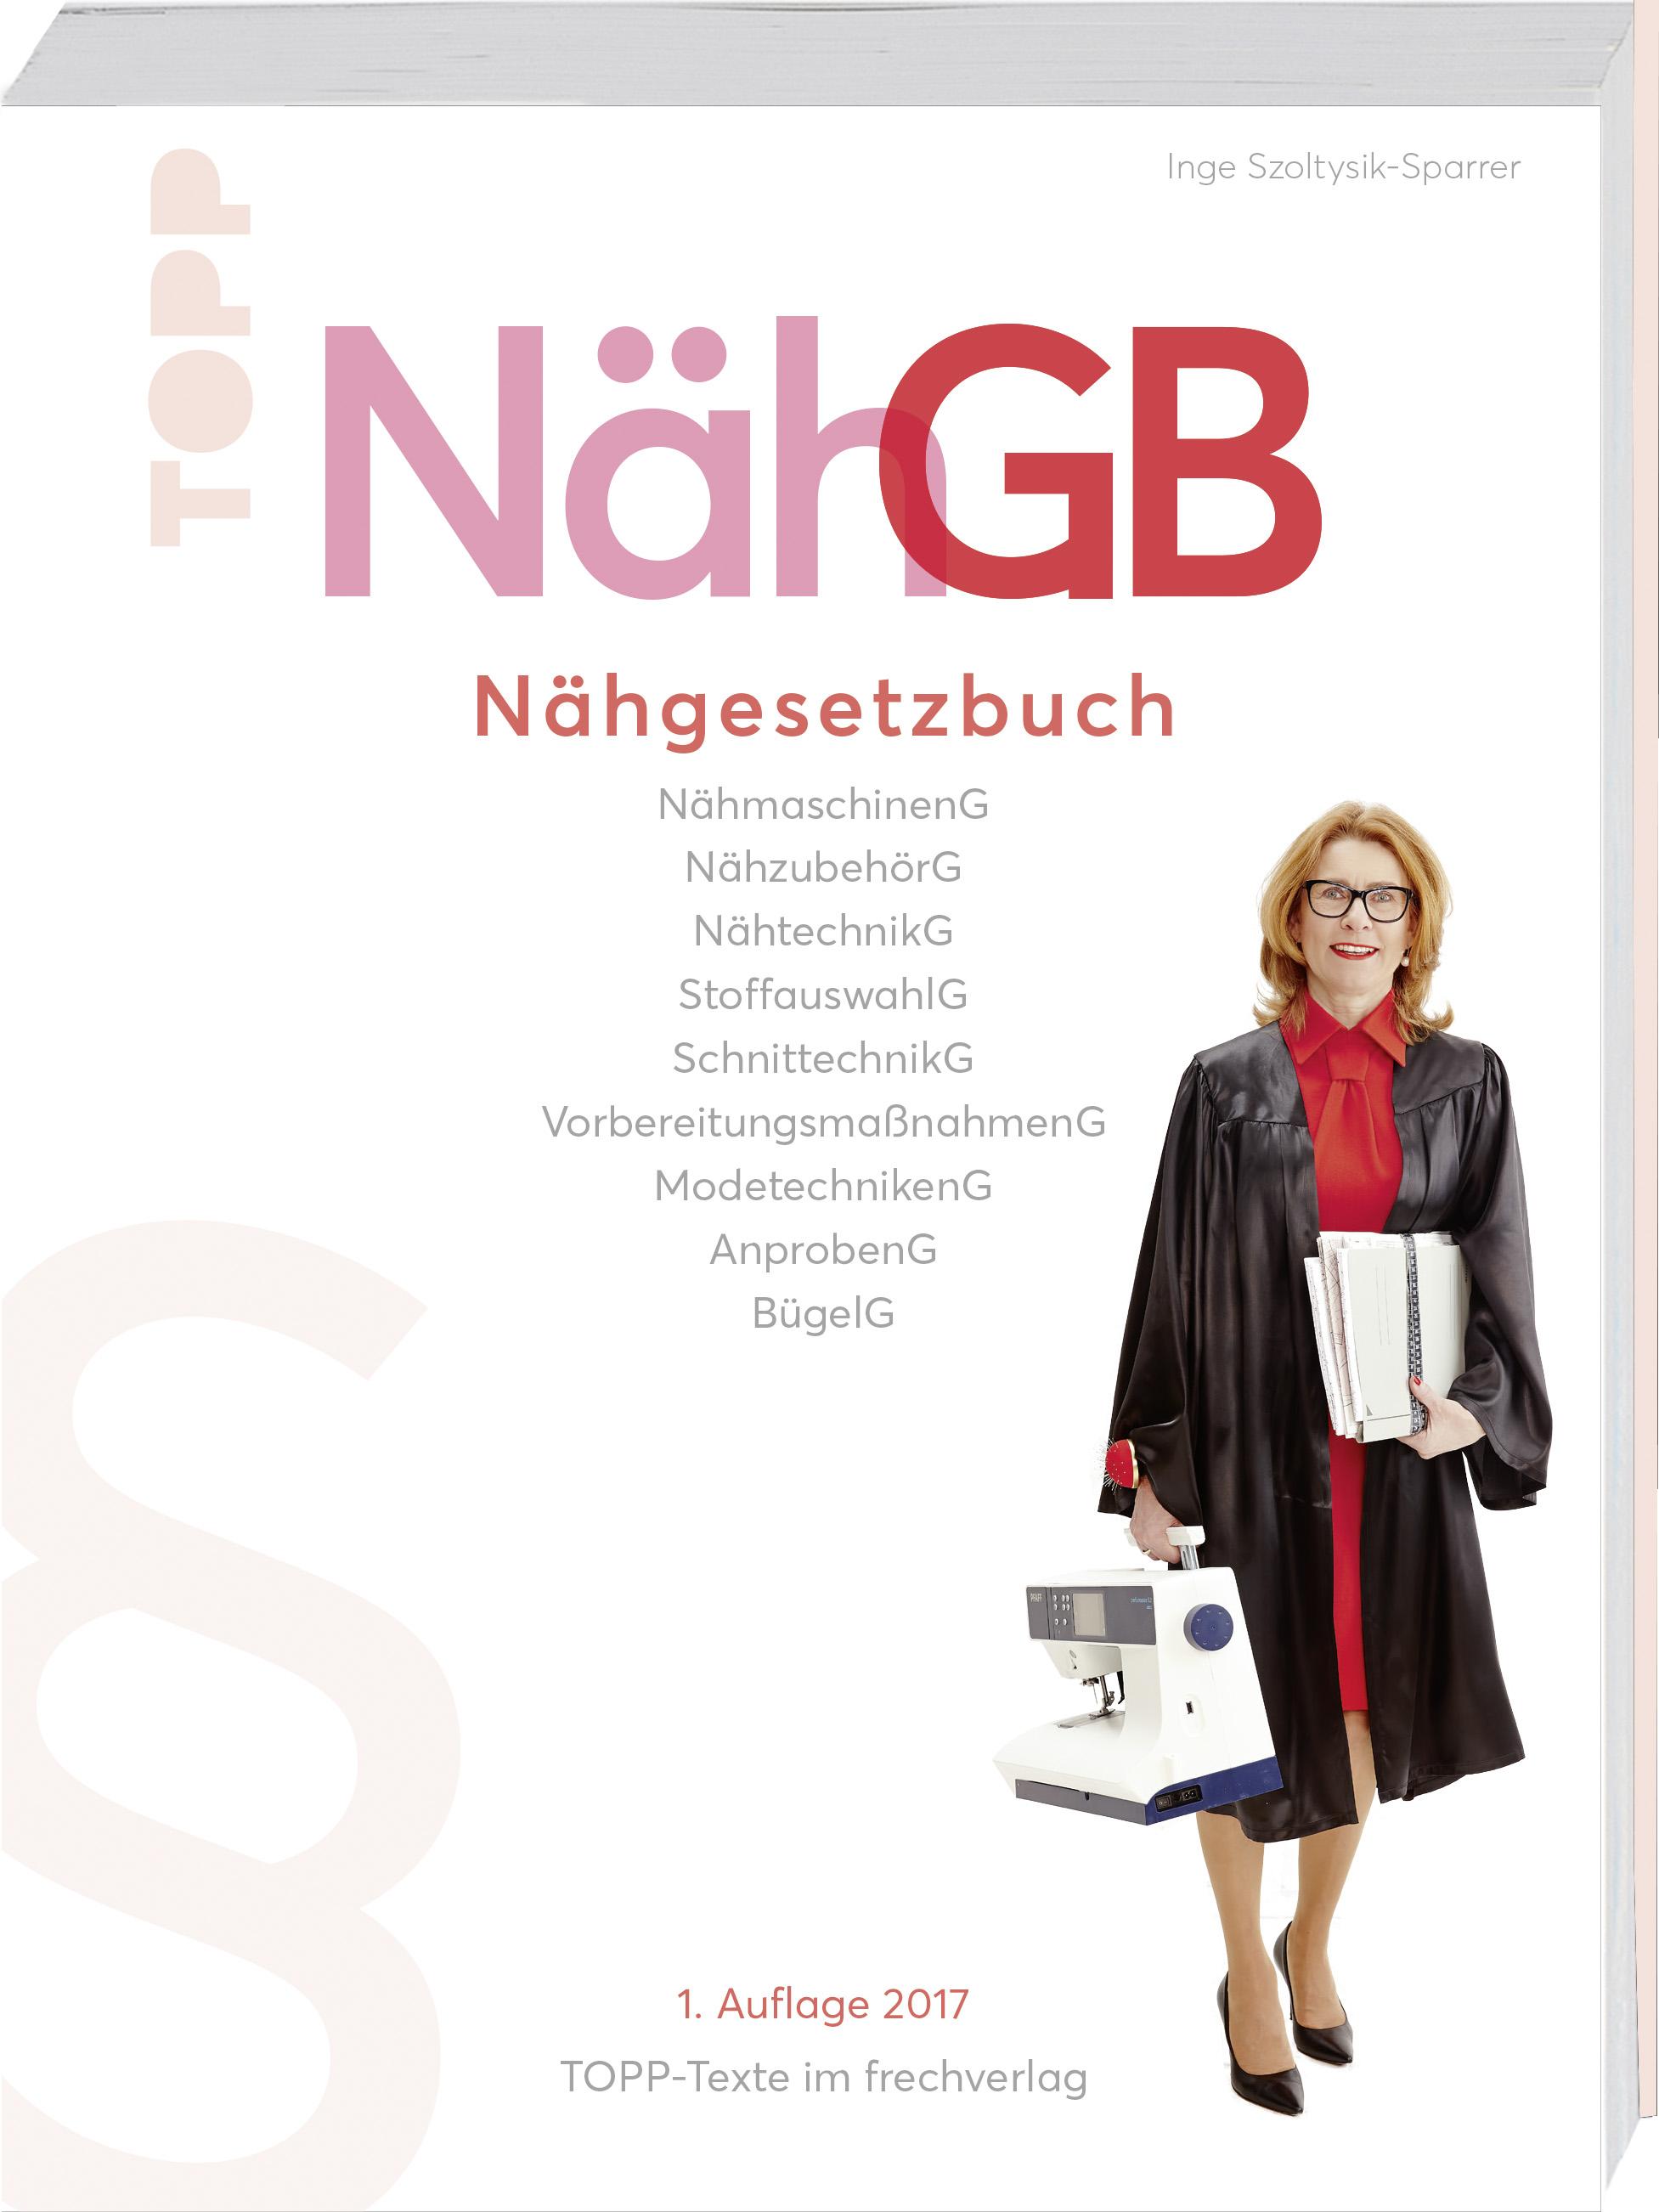 NähGB - Das Nähgesetzbuch